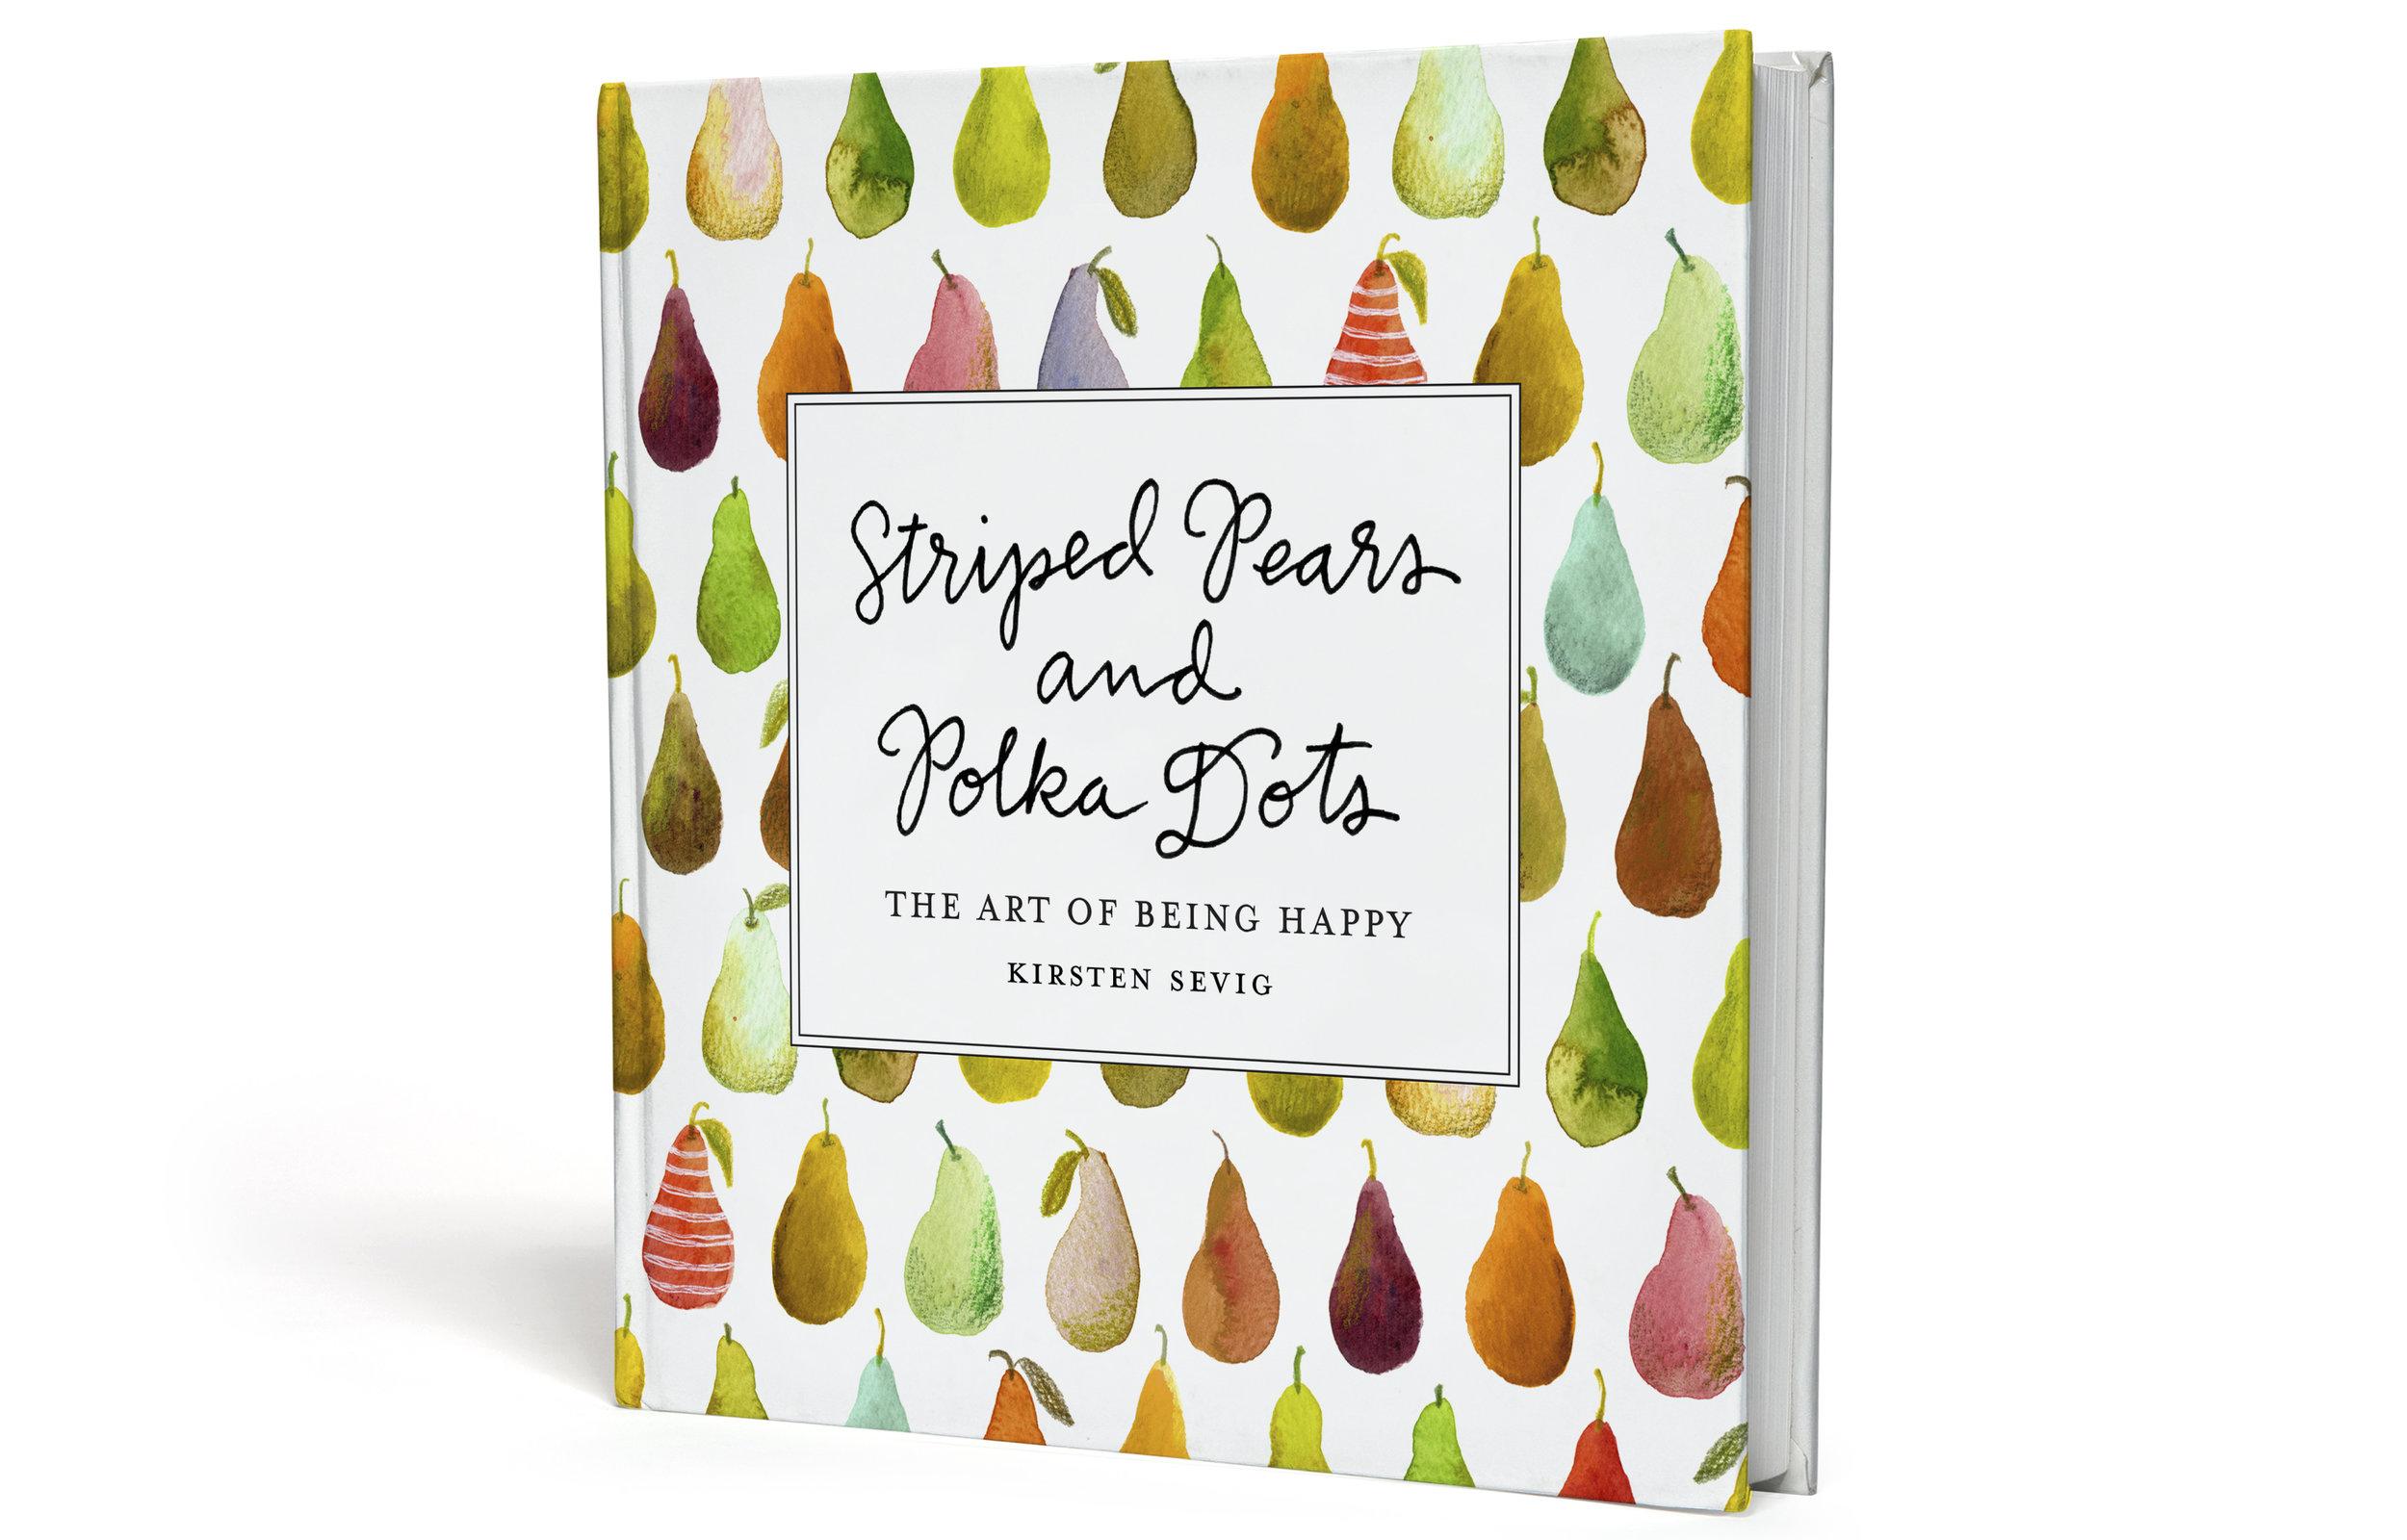 StripedPears_Book.jpg